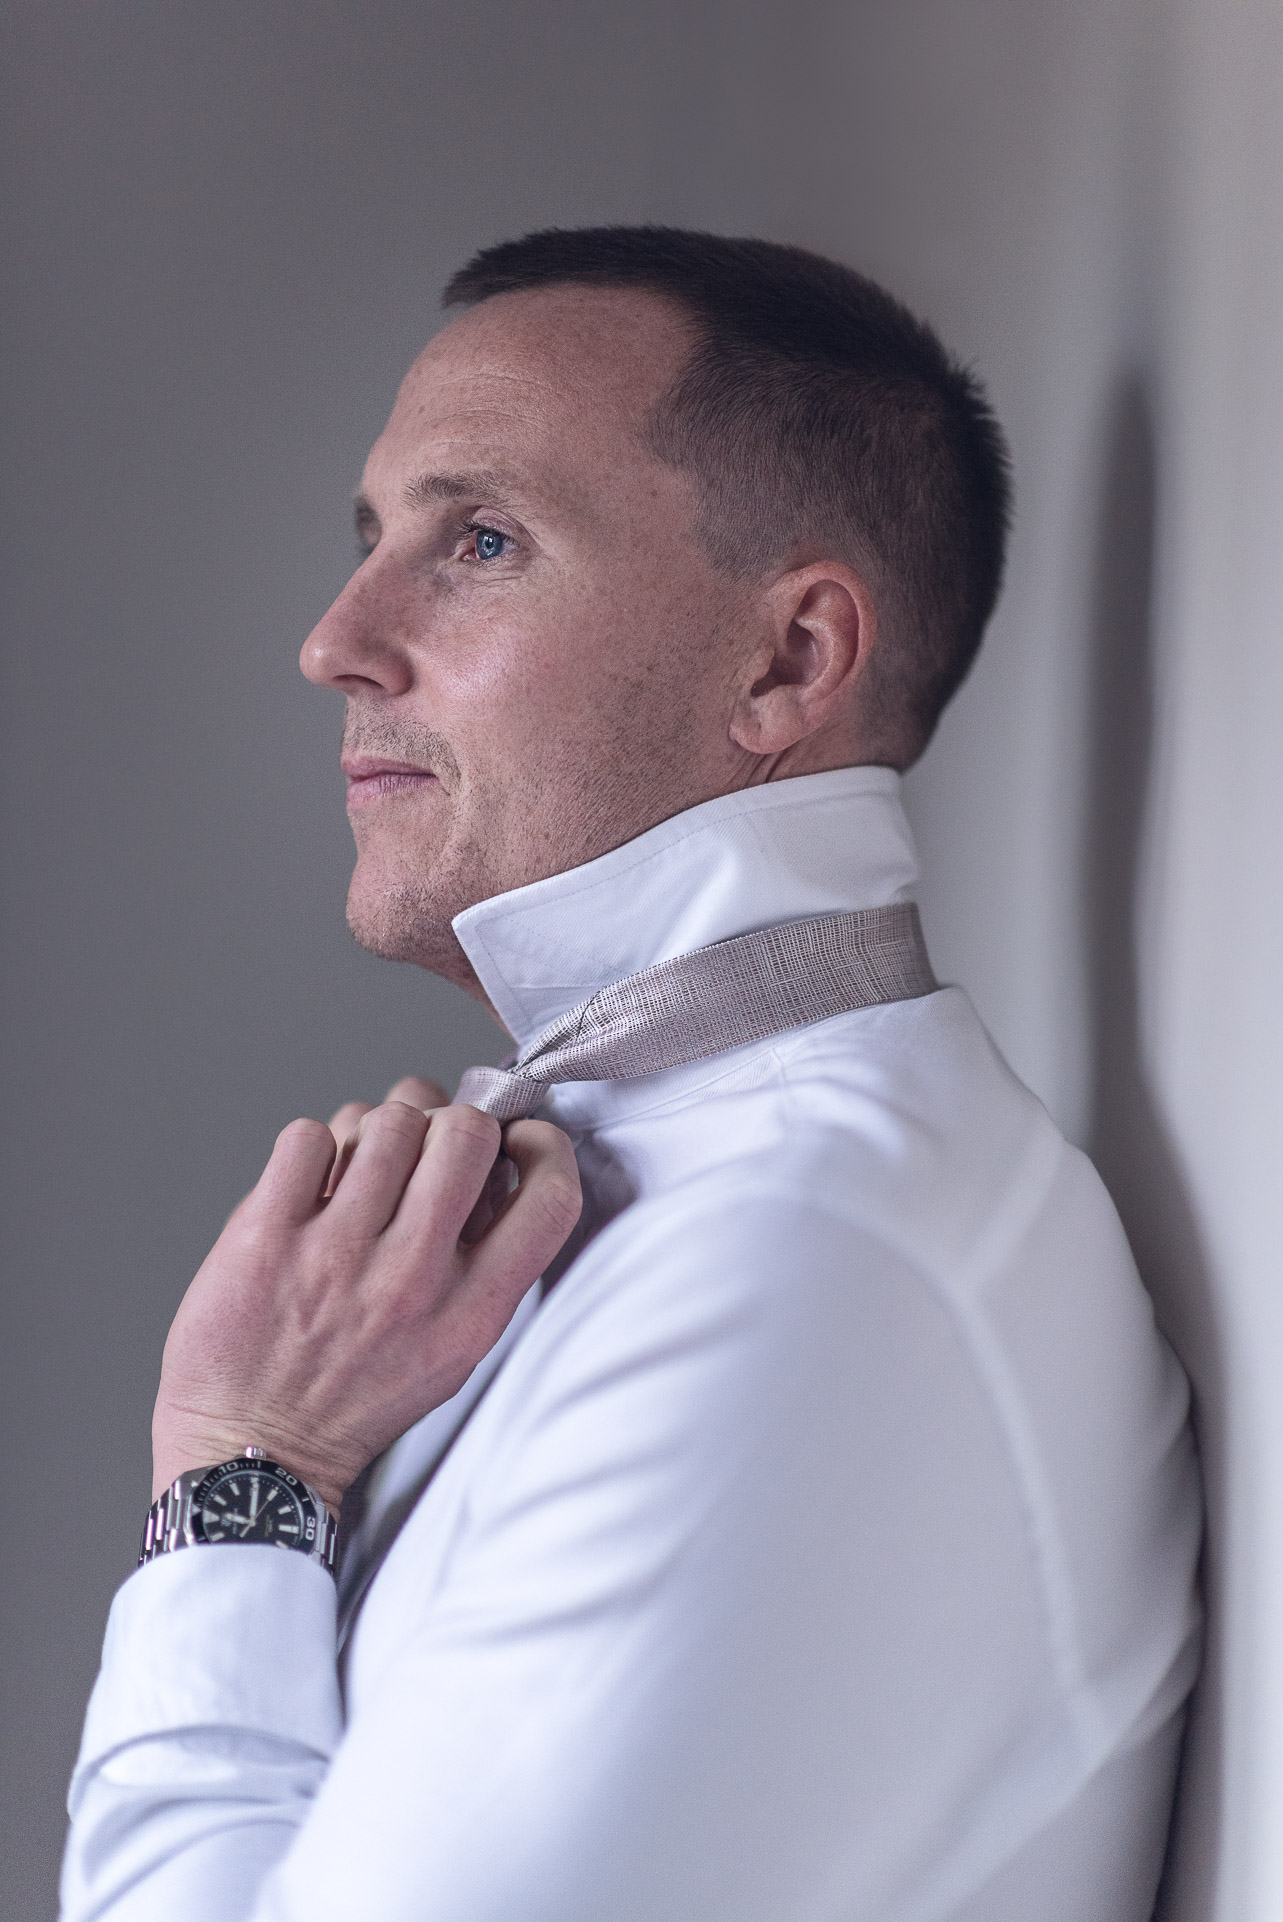 Wedding Photography featuring groom preparation adjusting tie